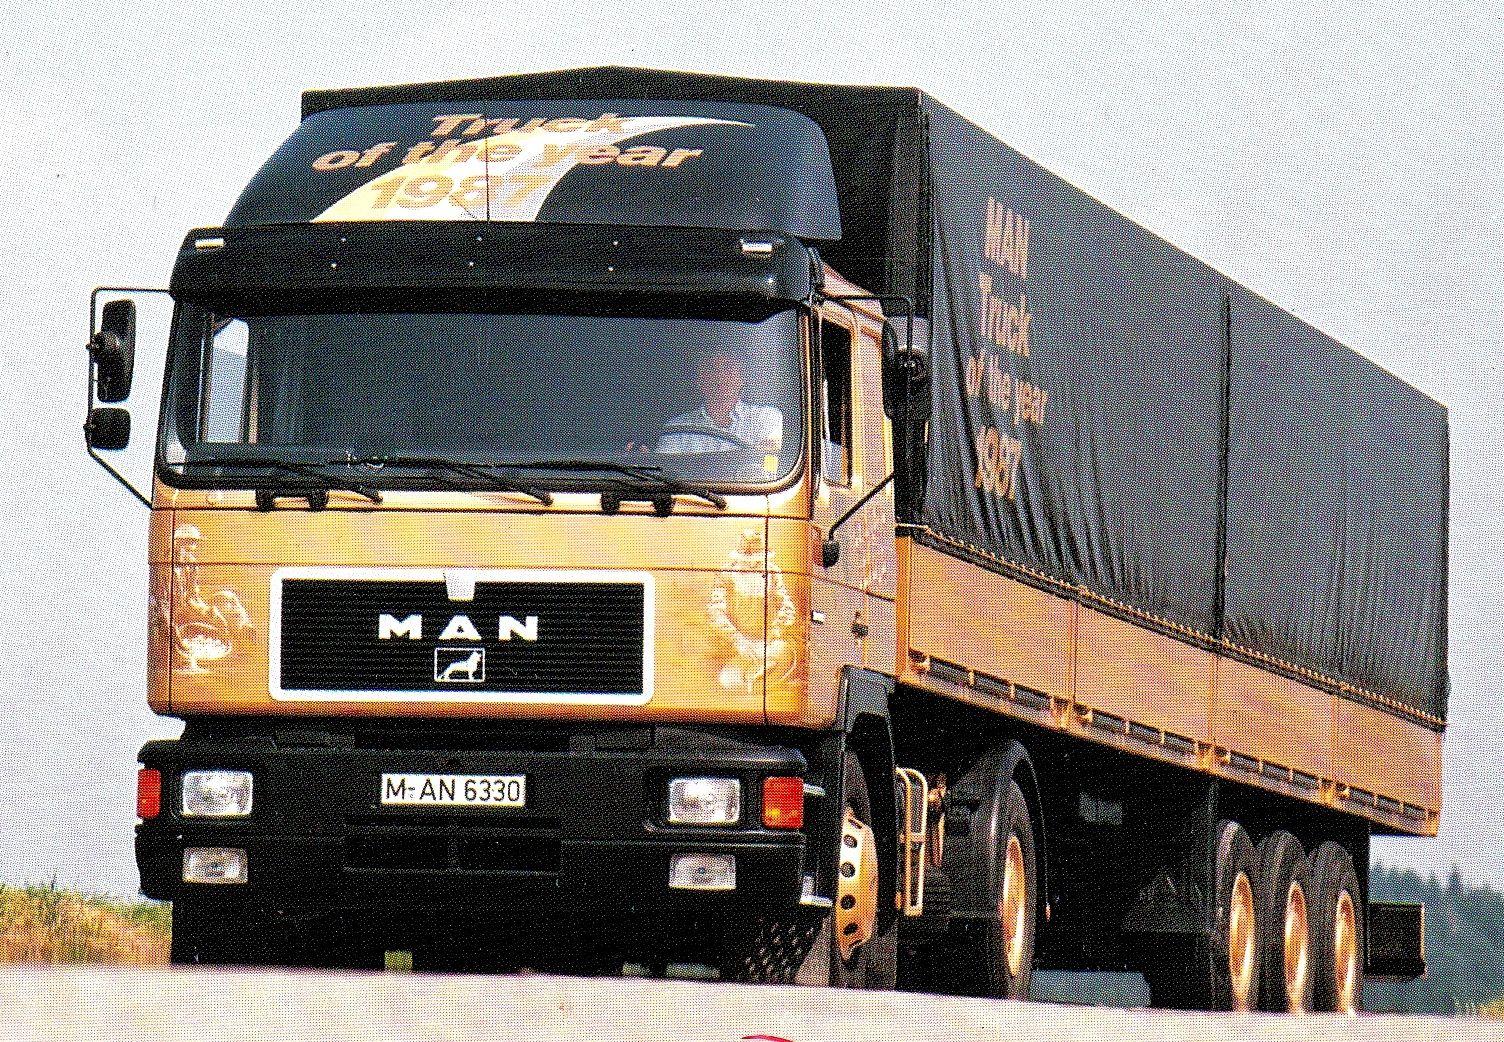 Golden Truck 1987- Painted with real 24 carat gold. #airbrush #art #artwork #truck #trucking #simoriikonen #airbrushartist #man #gold